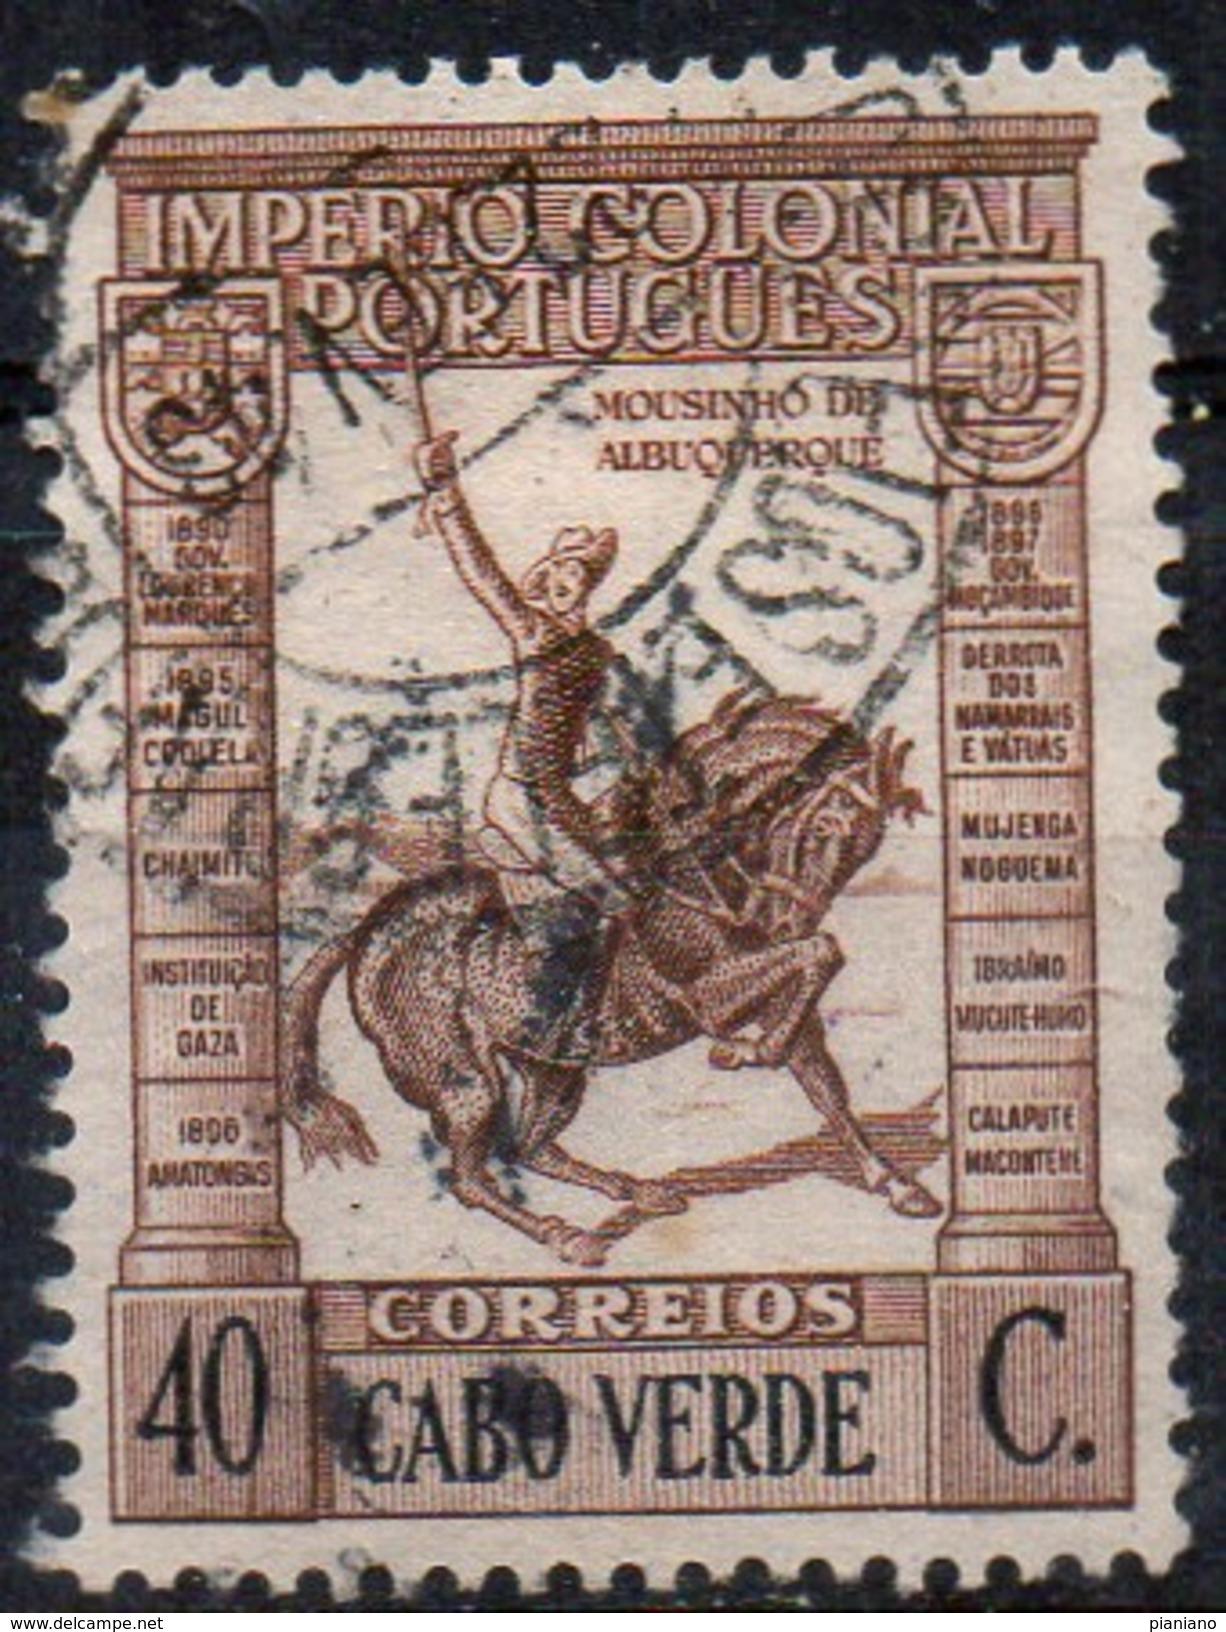 PIA - ANGOLA - 1938-40  - Tipo Dei Francobolli Di Angola : J.Mousinho De Albuquerque  - (Yv  234) - Angola